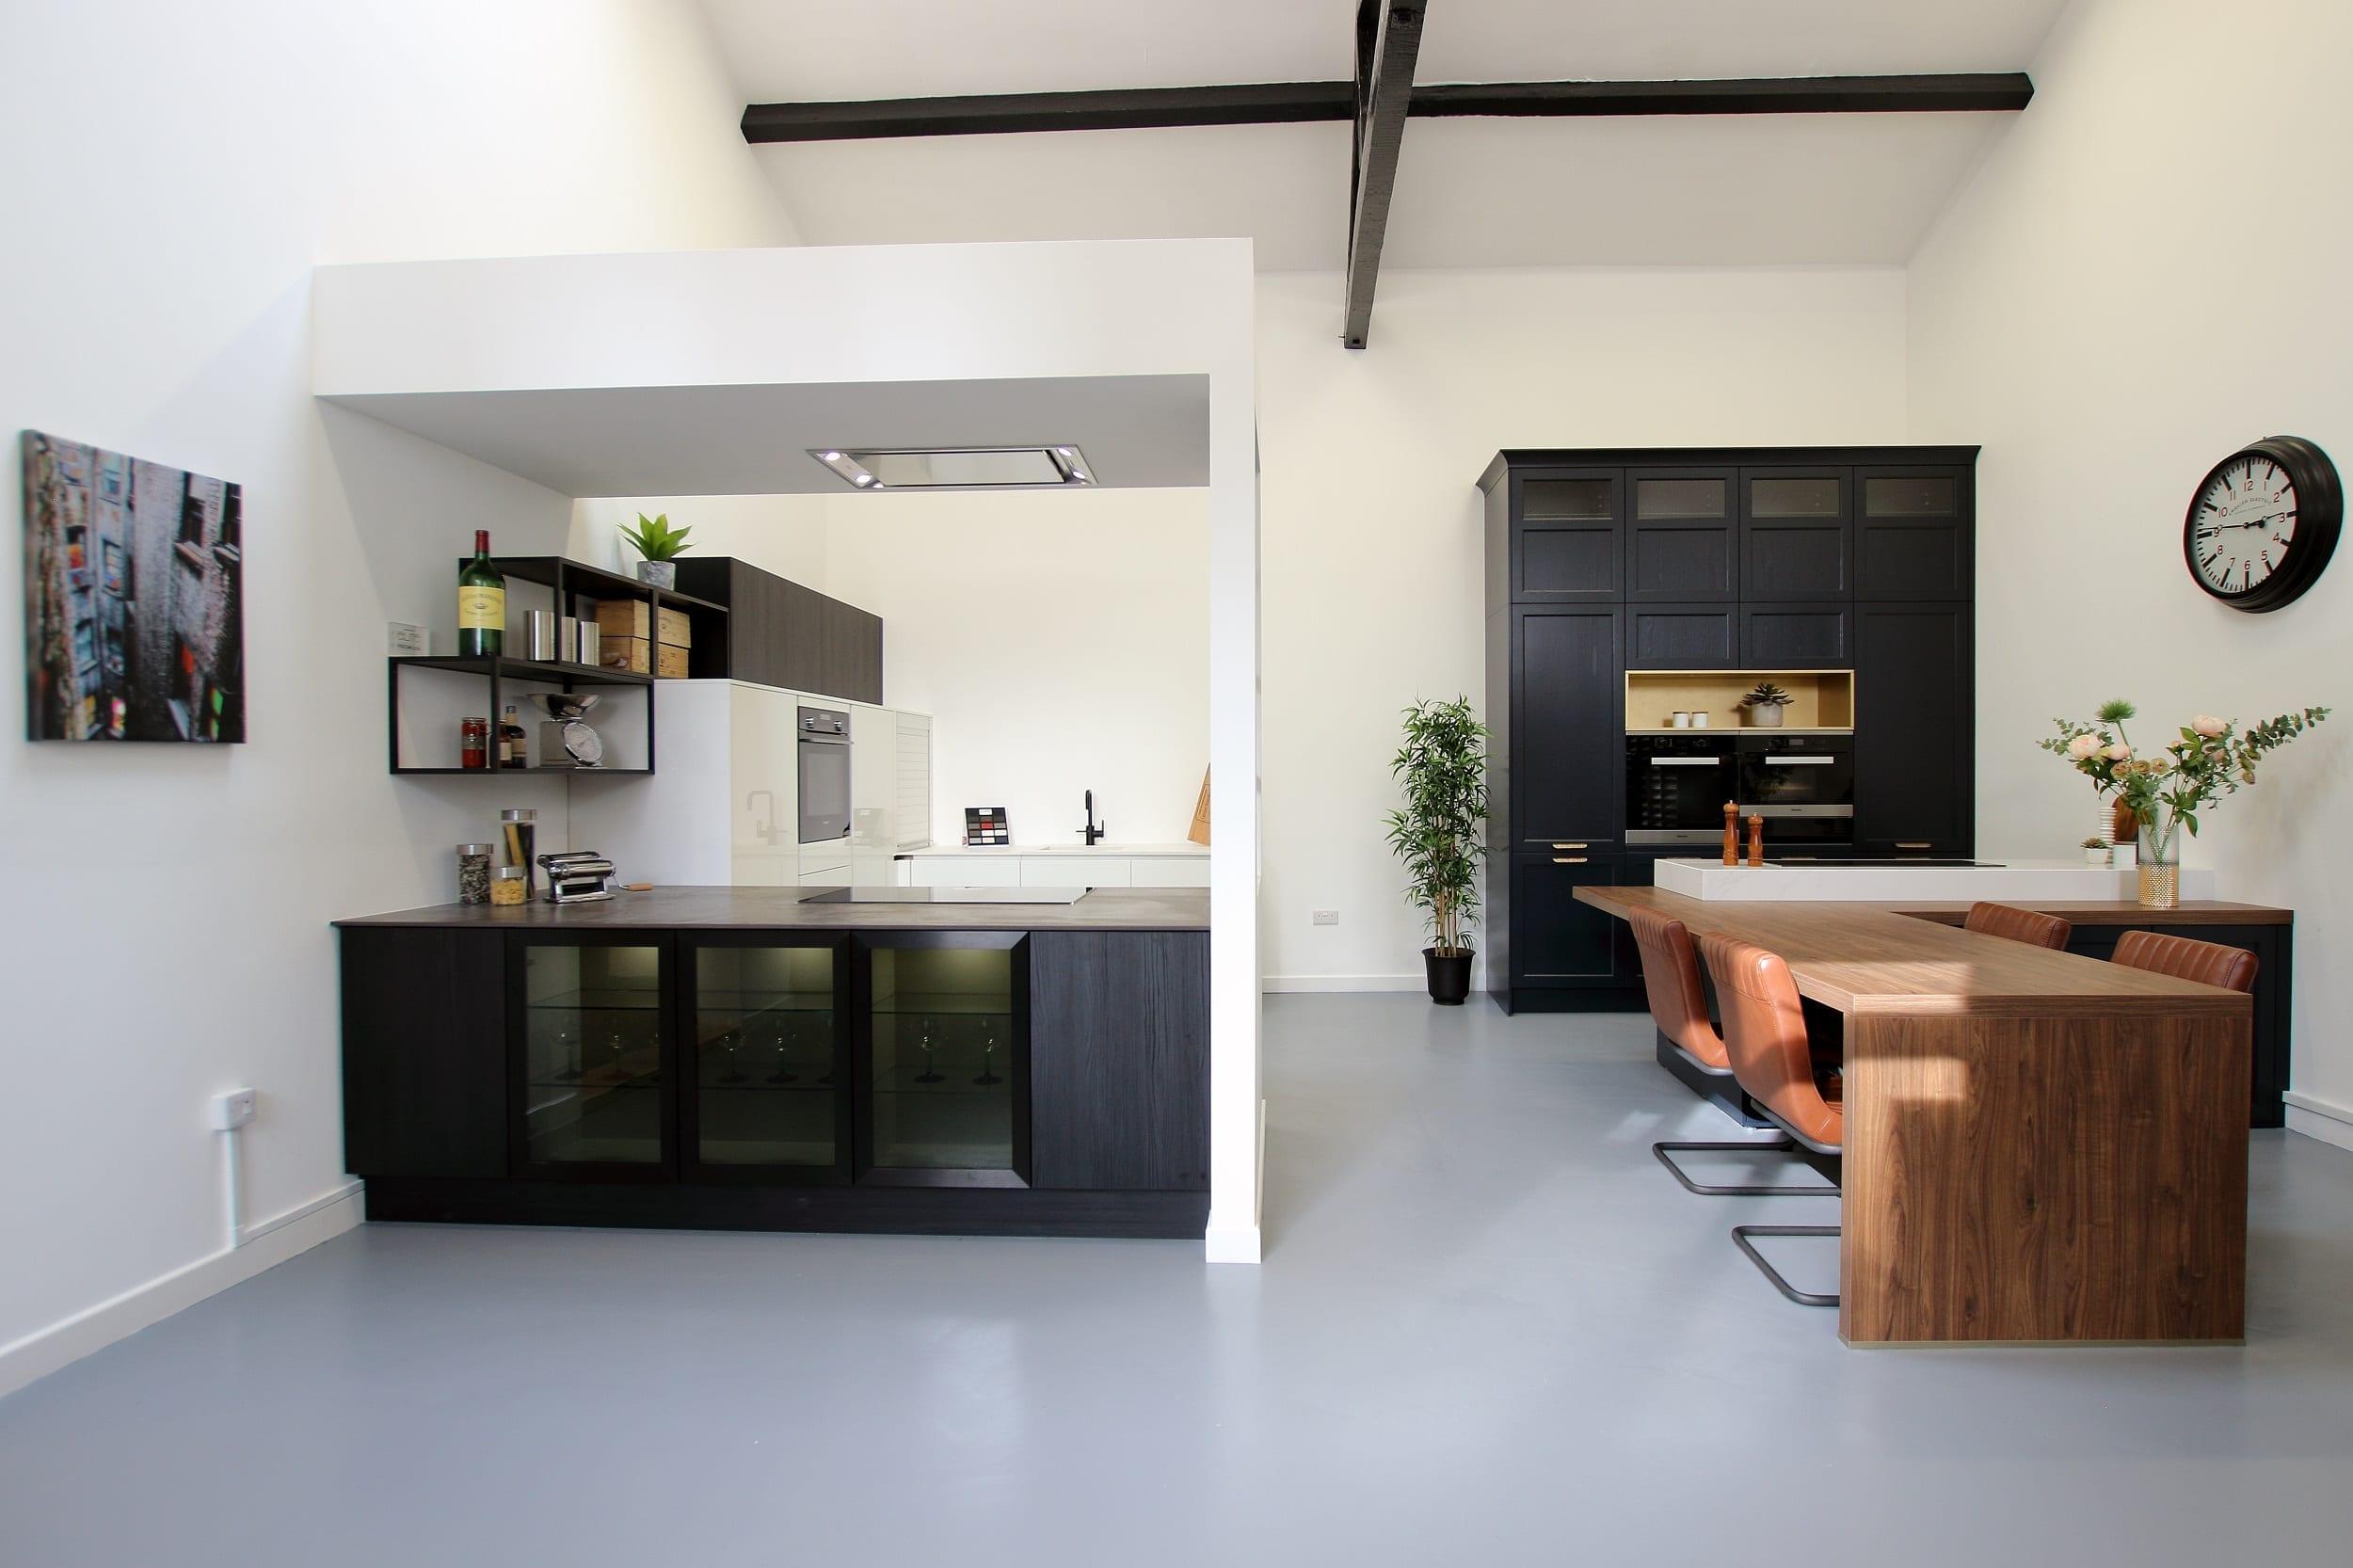 IMG 8175 - Net Kitchens Direct, Walthamstow